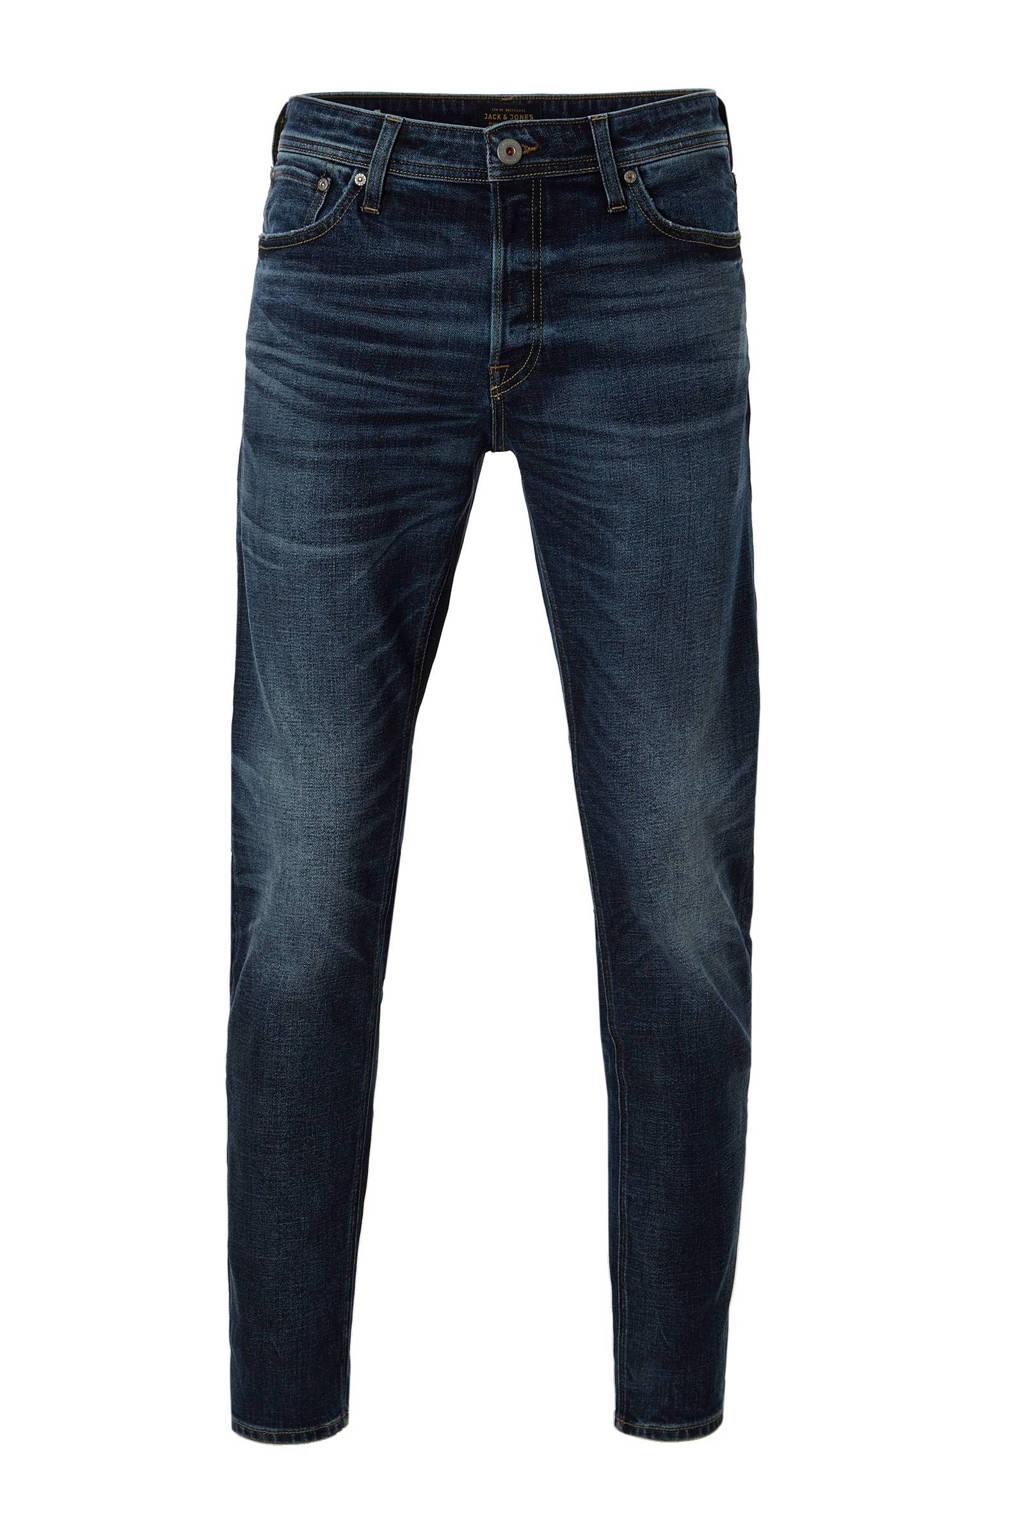 Jack & Jones Mike comfort fit jeans, 771 Blue Denim